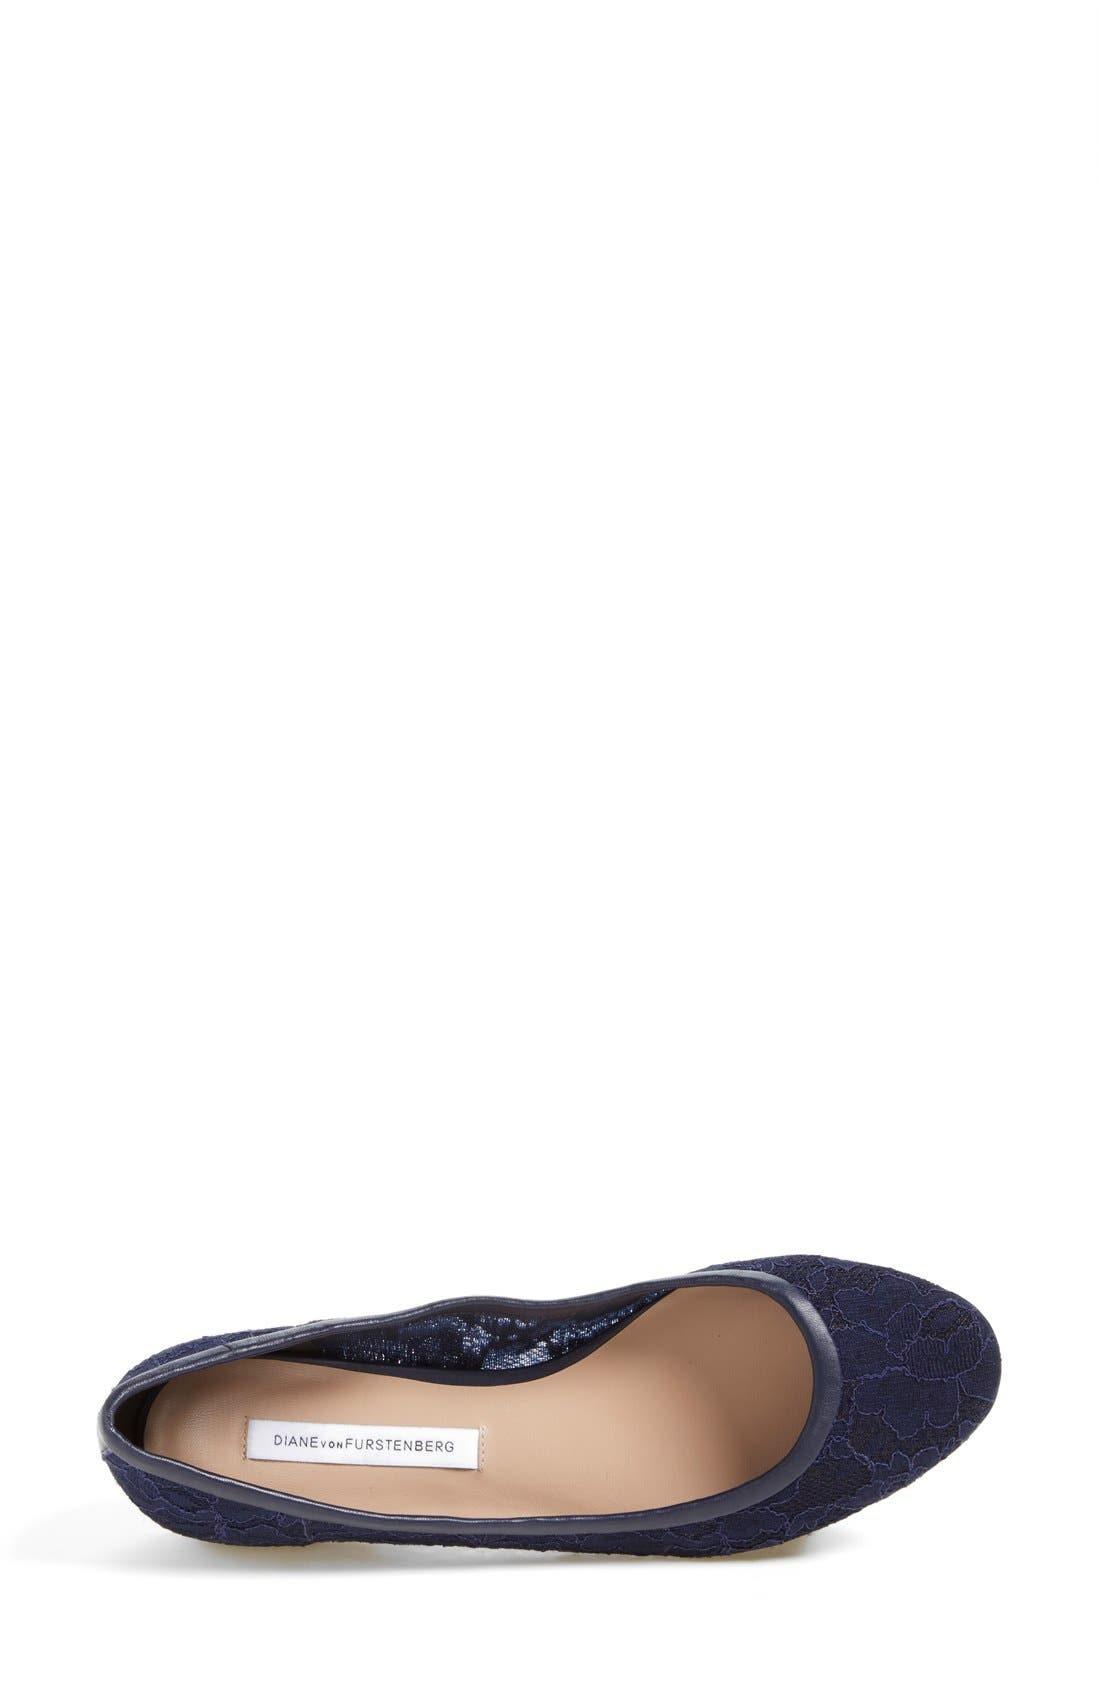 'Marano' Lace Ballet Flat,                             Alternate thumbnail 3, color,                             Navy Lace